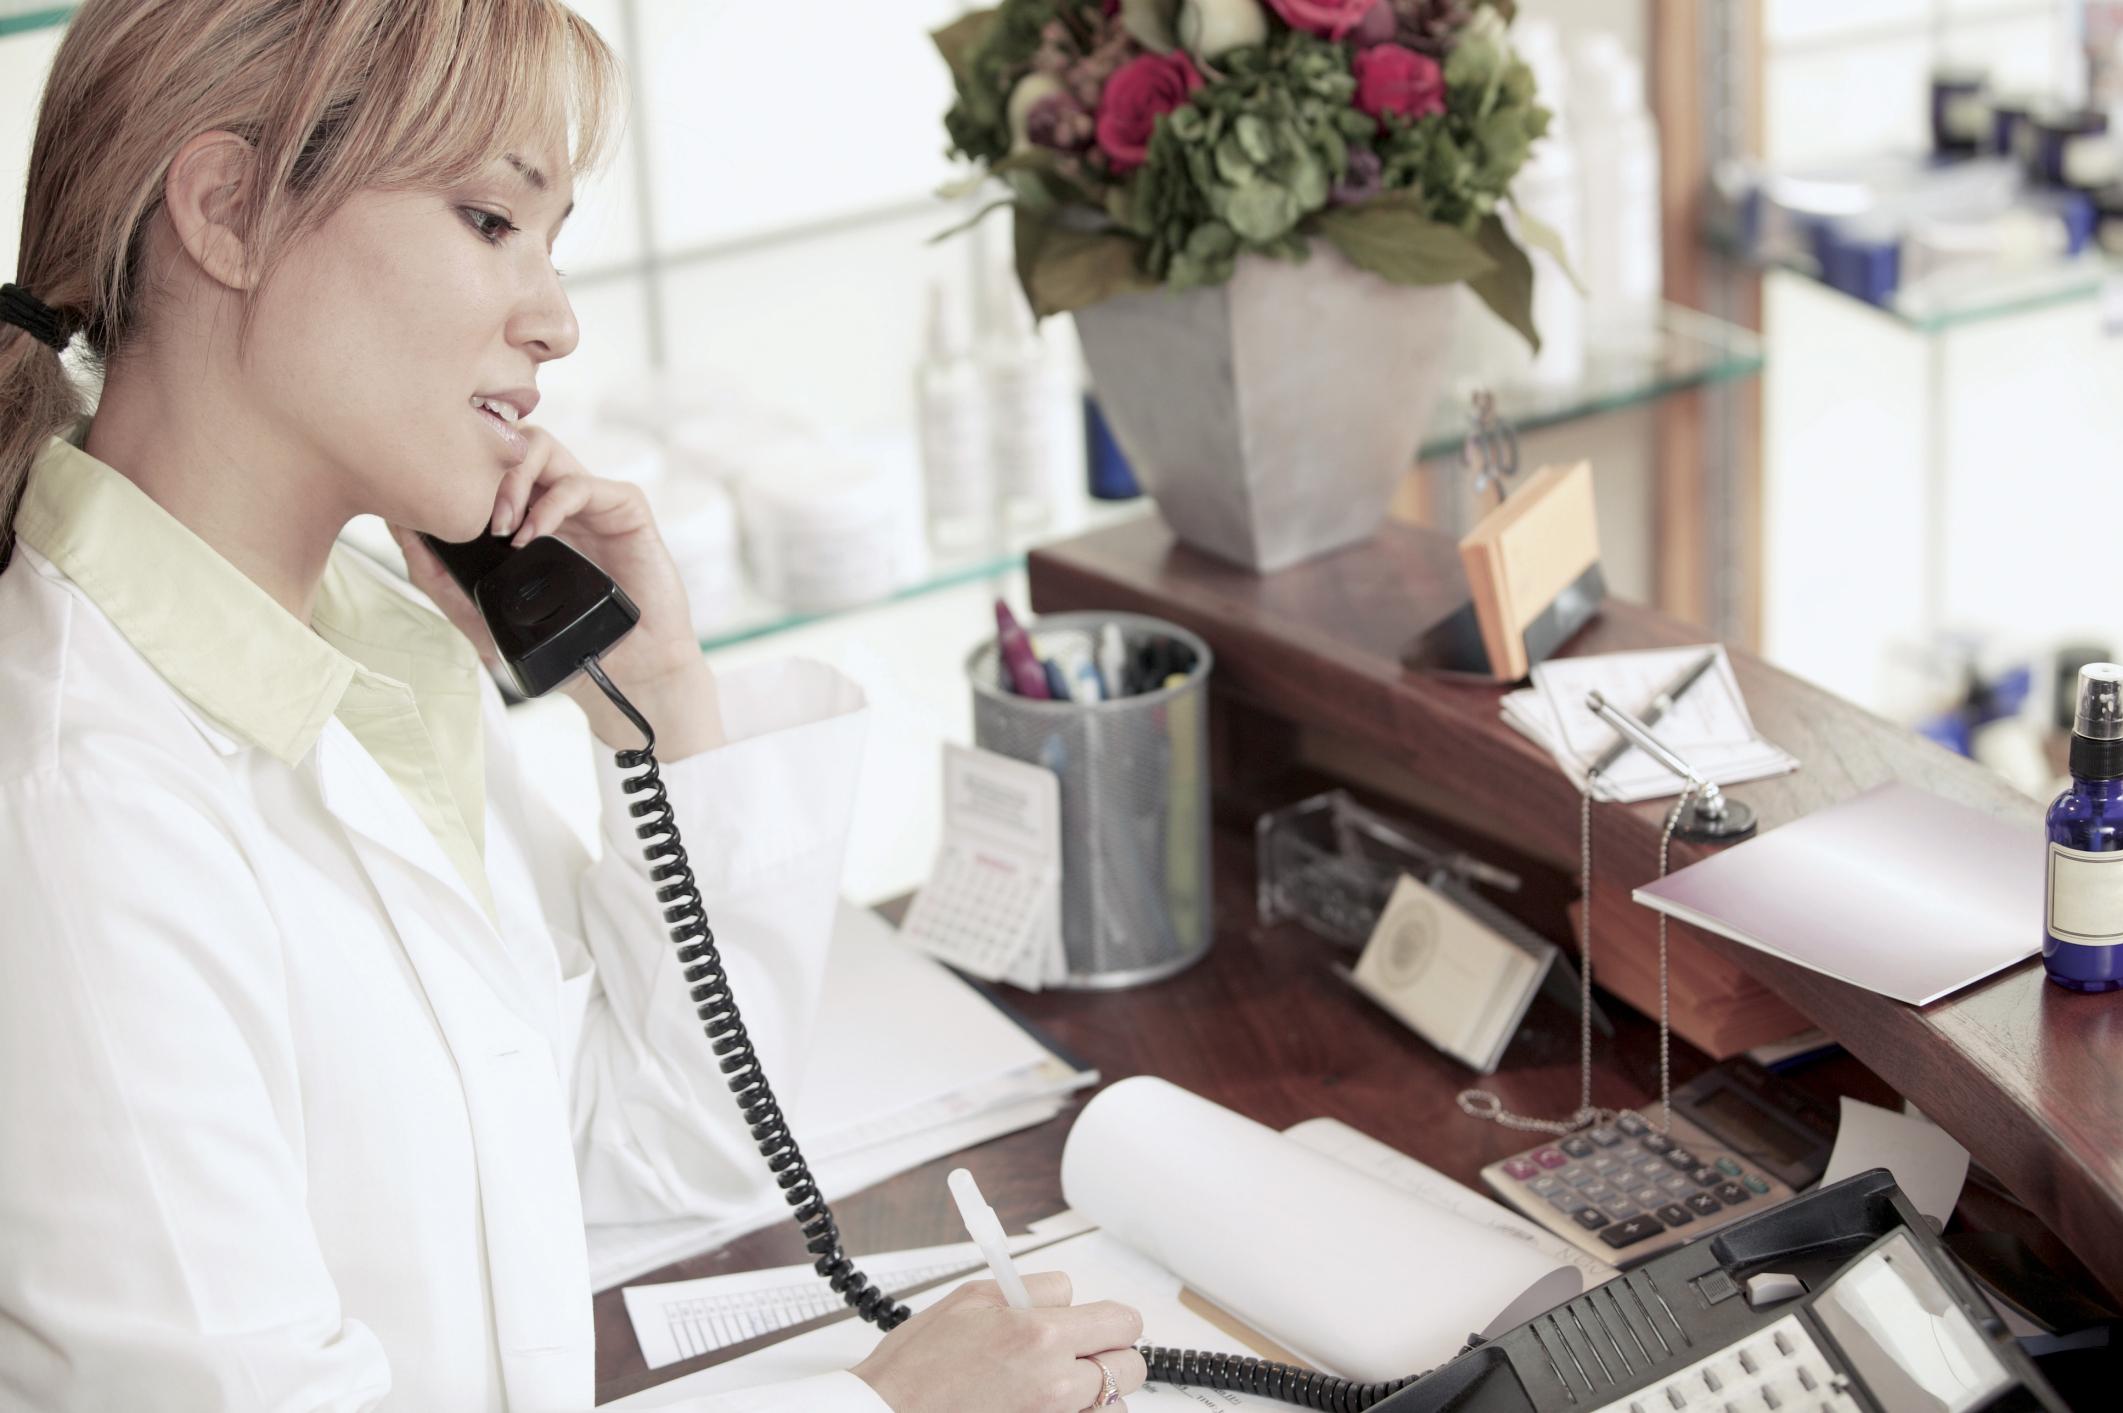 salon receptionist